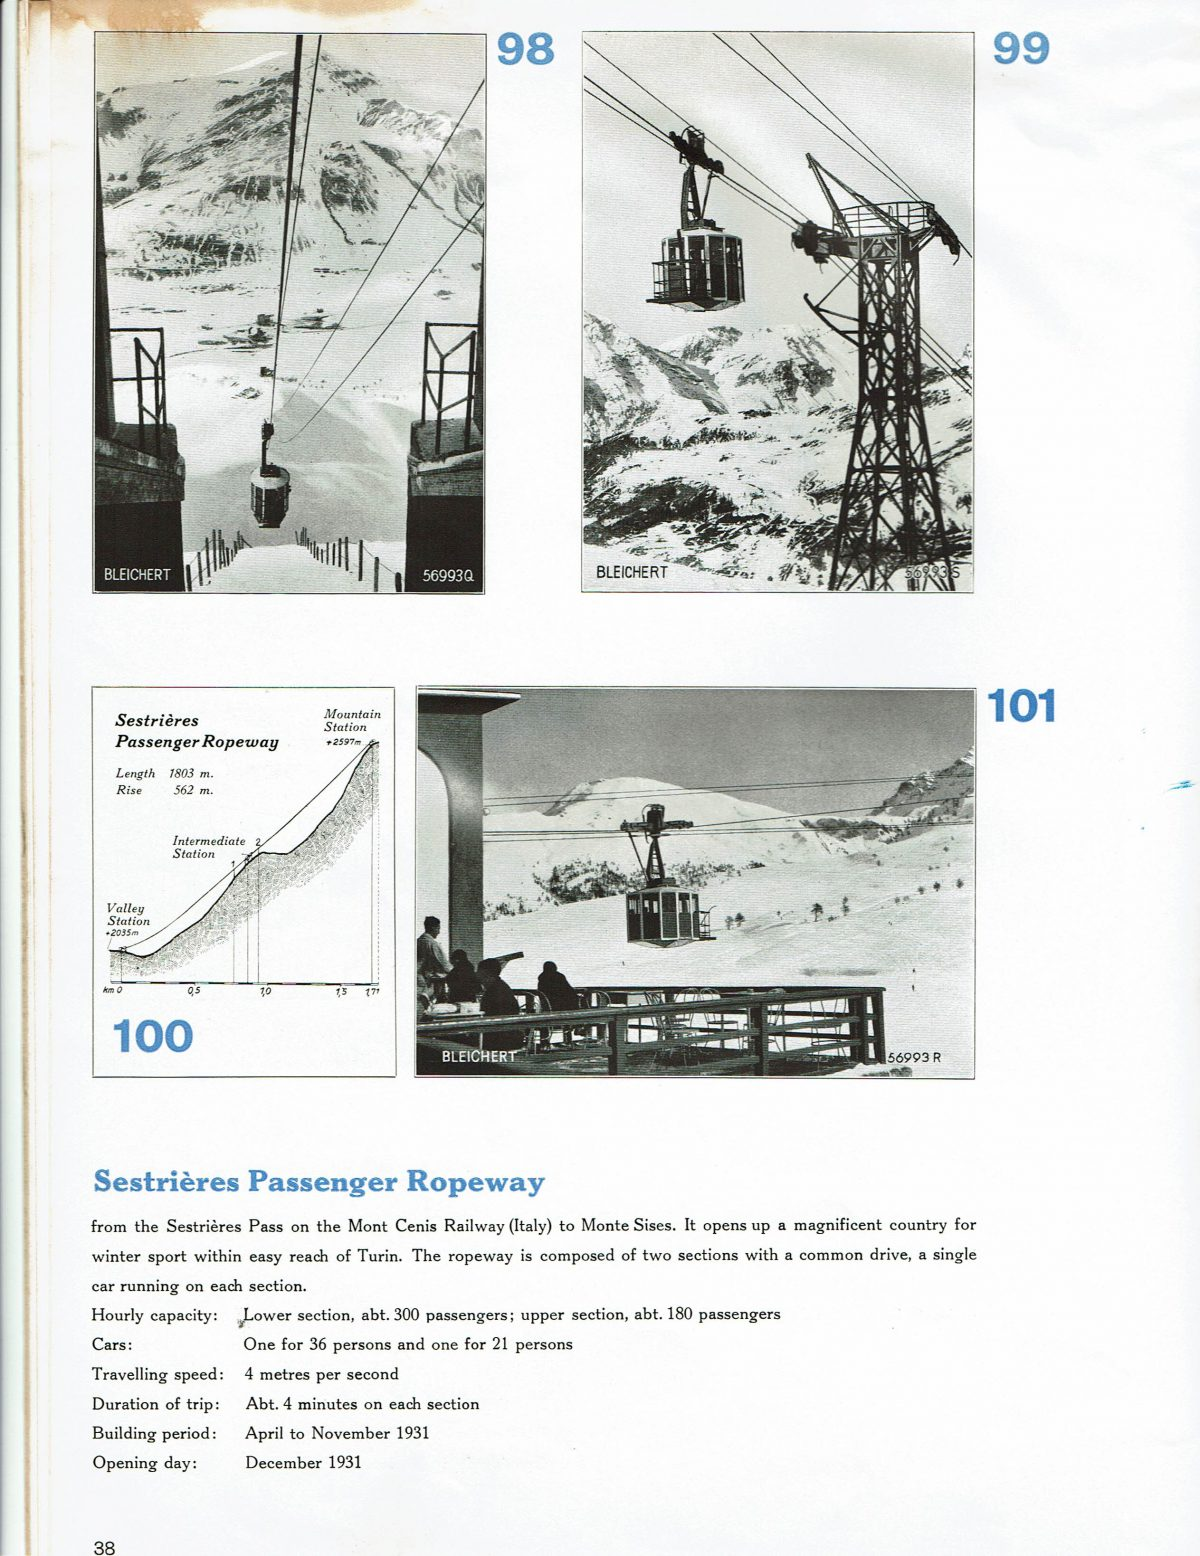 1933 Bleichert Passenger Arial Ropeways 33